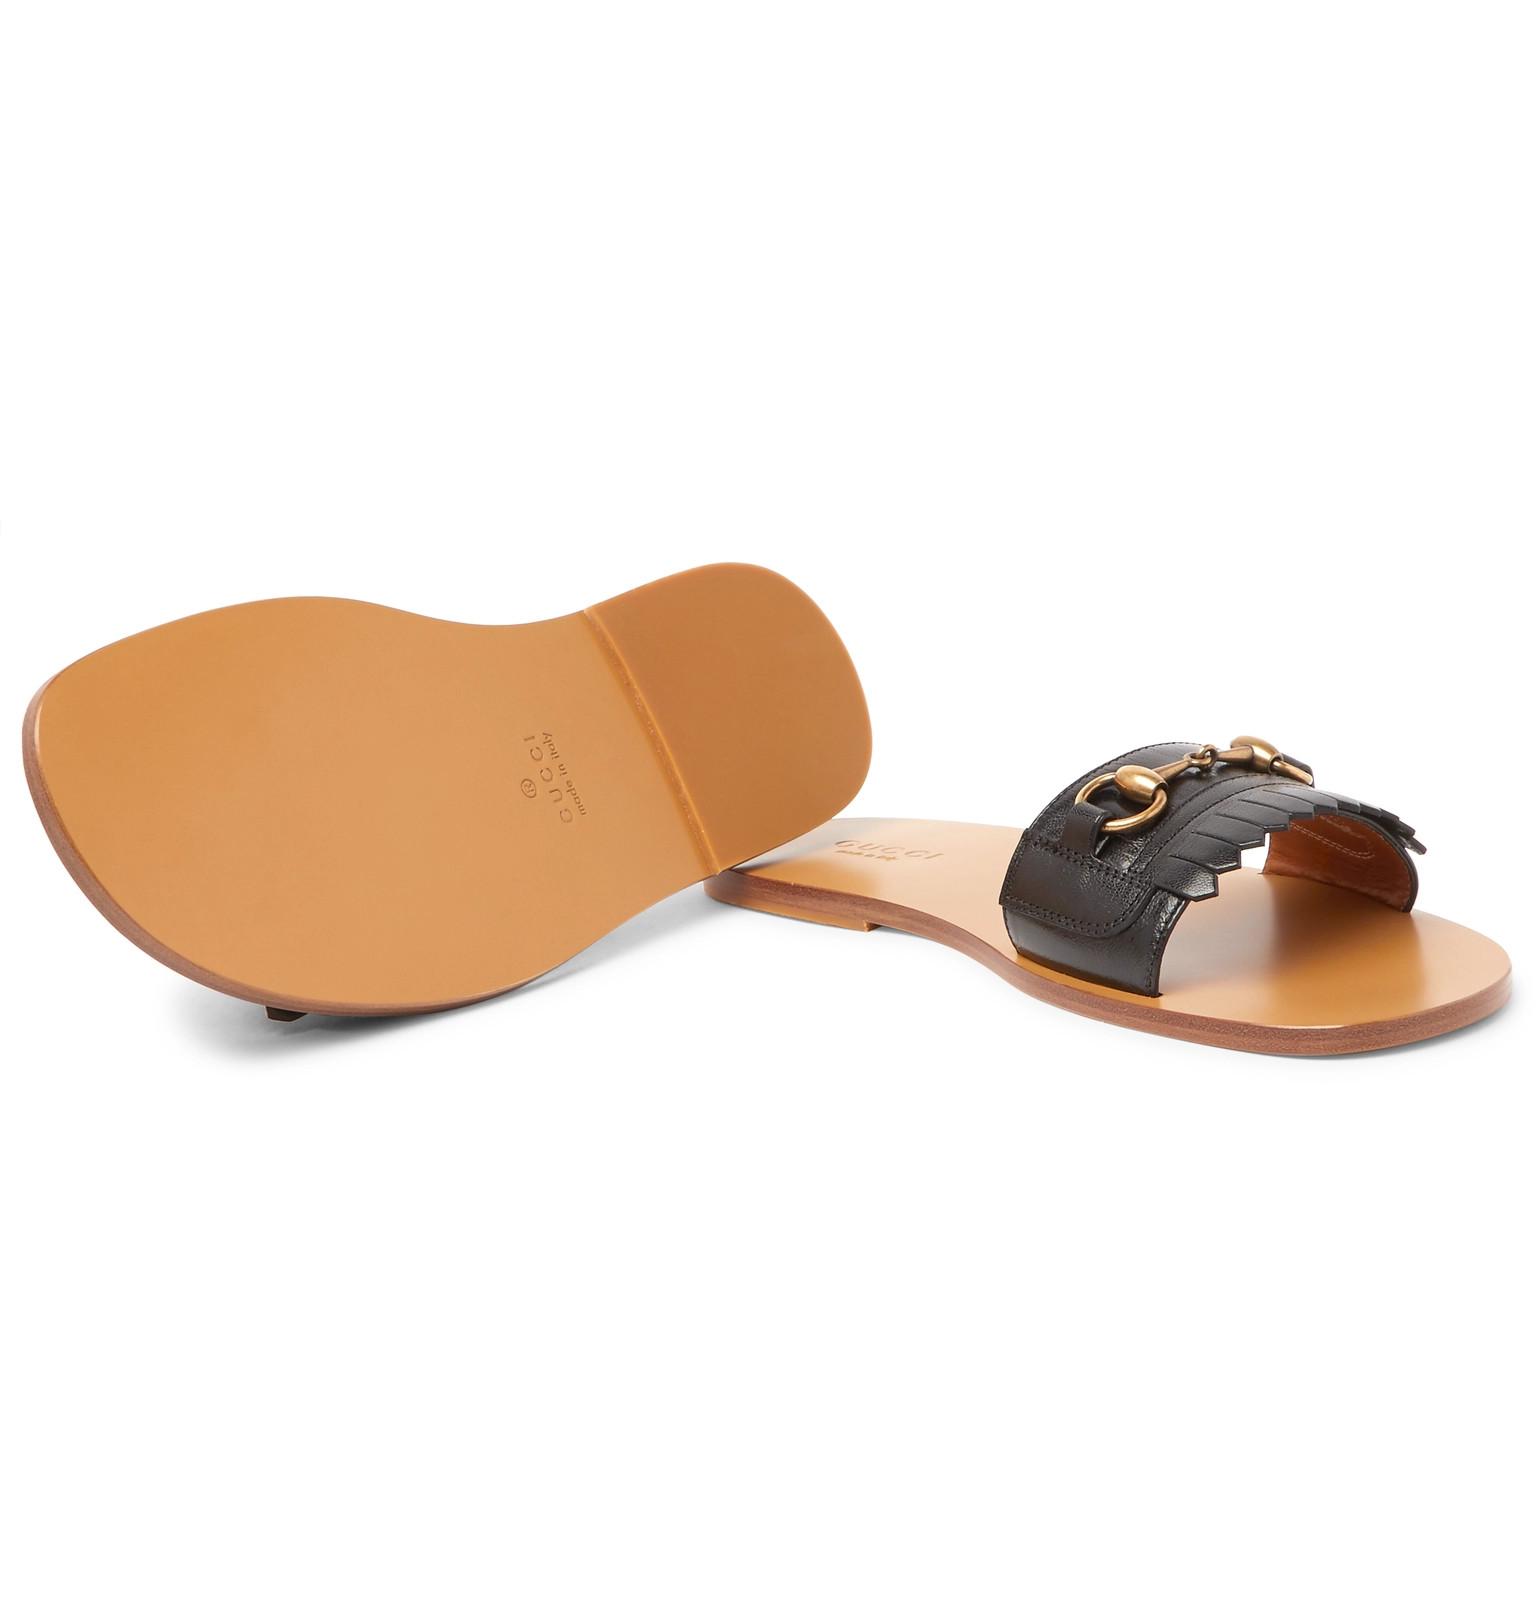 bc0622ad8 Gucci - Horsebit Fringed Leather Sandals